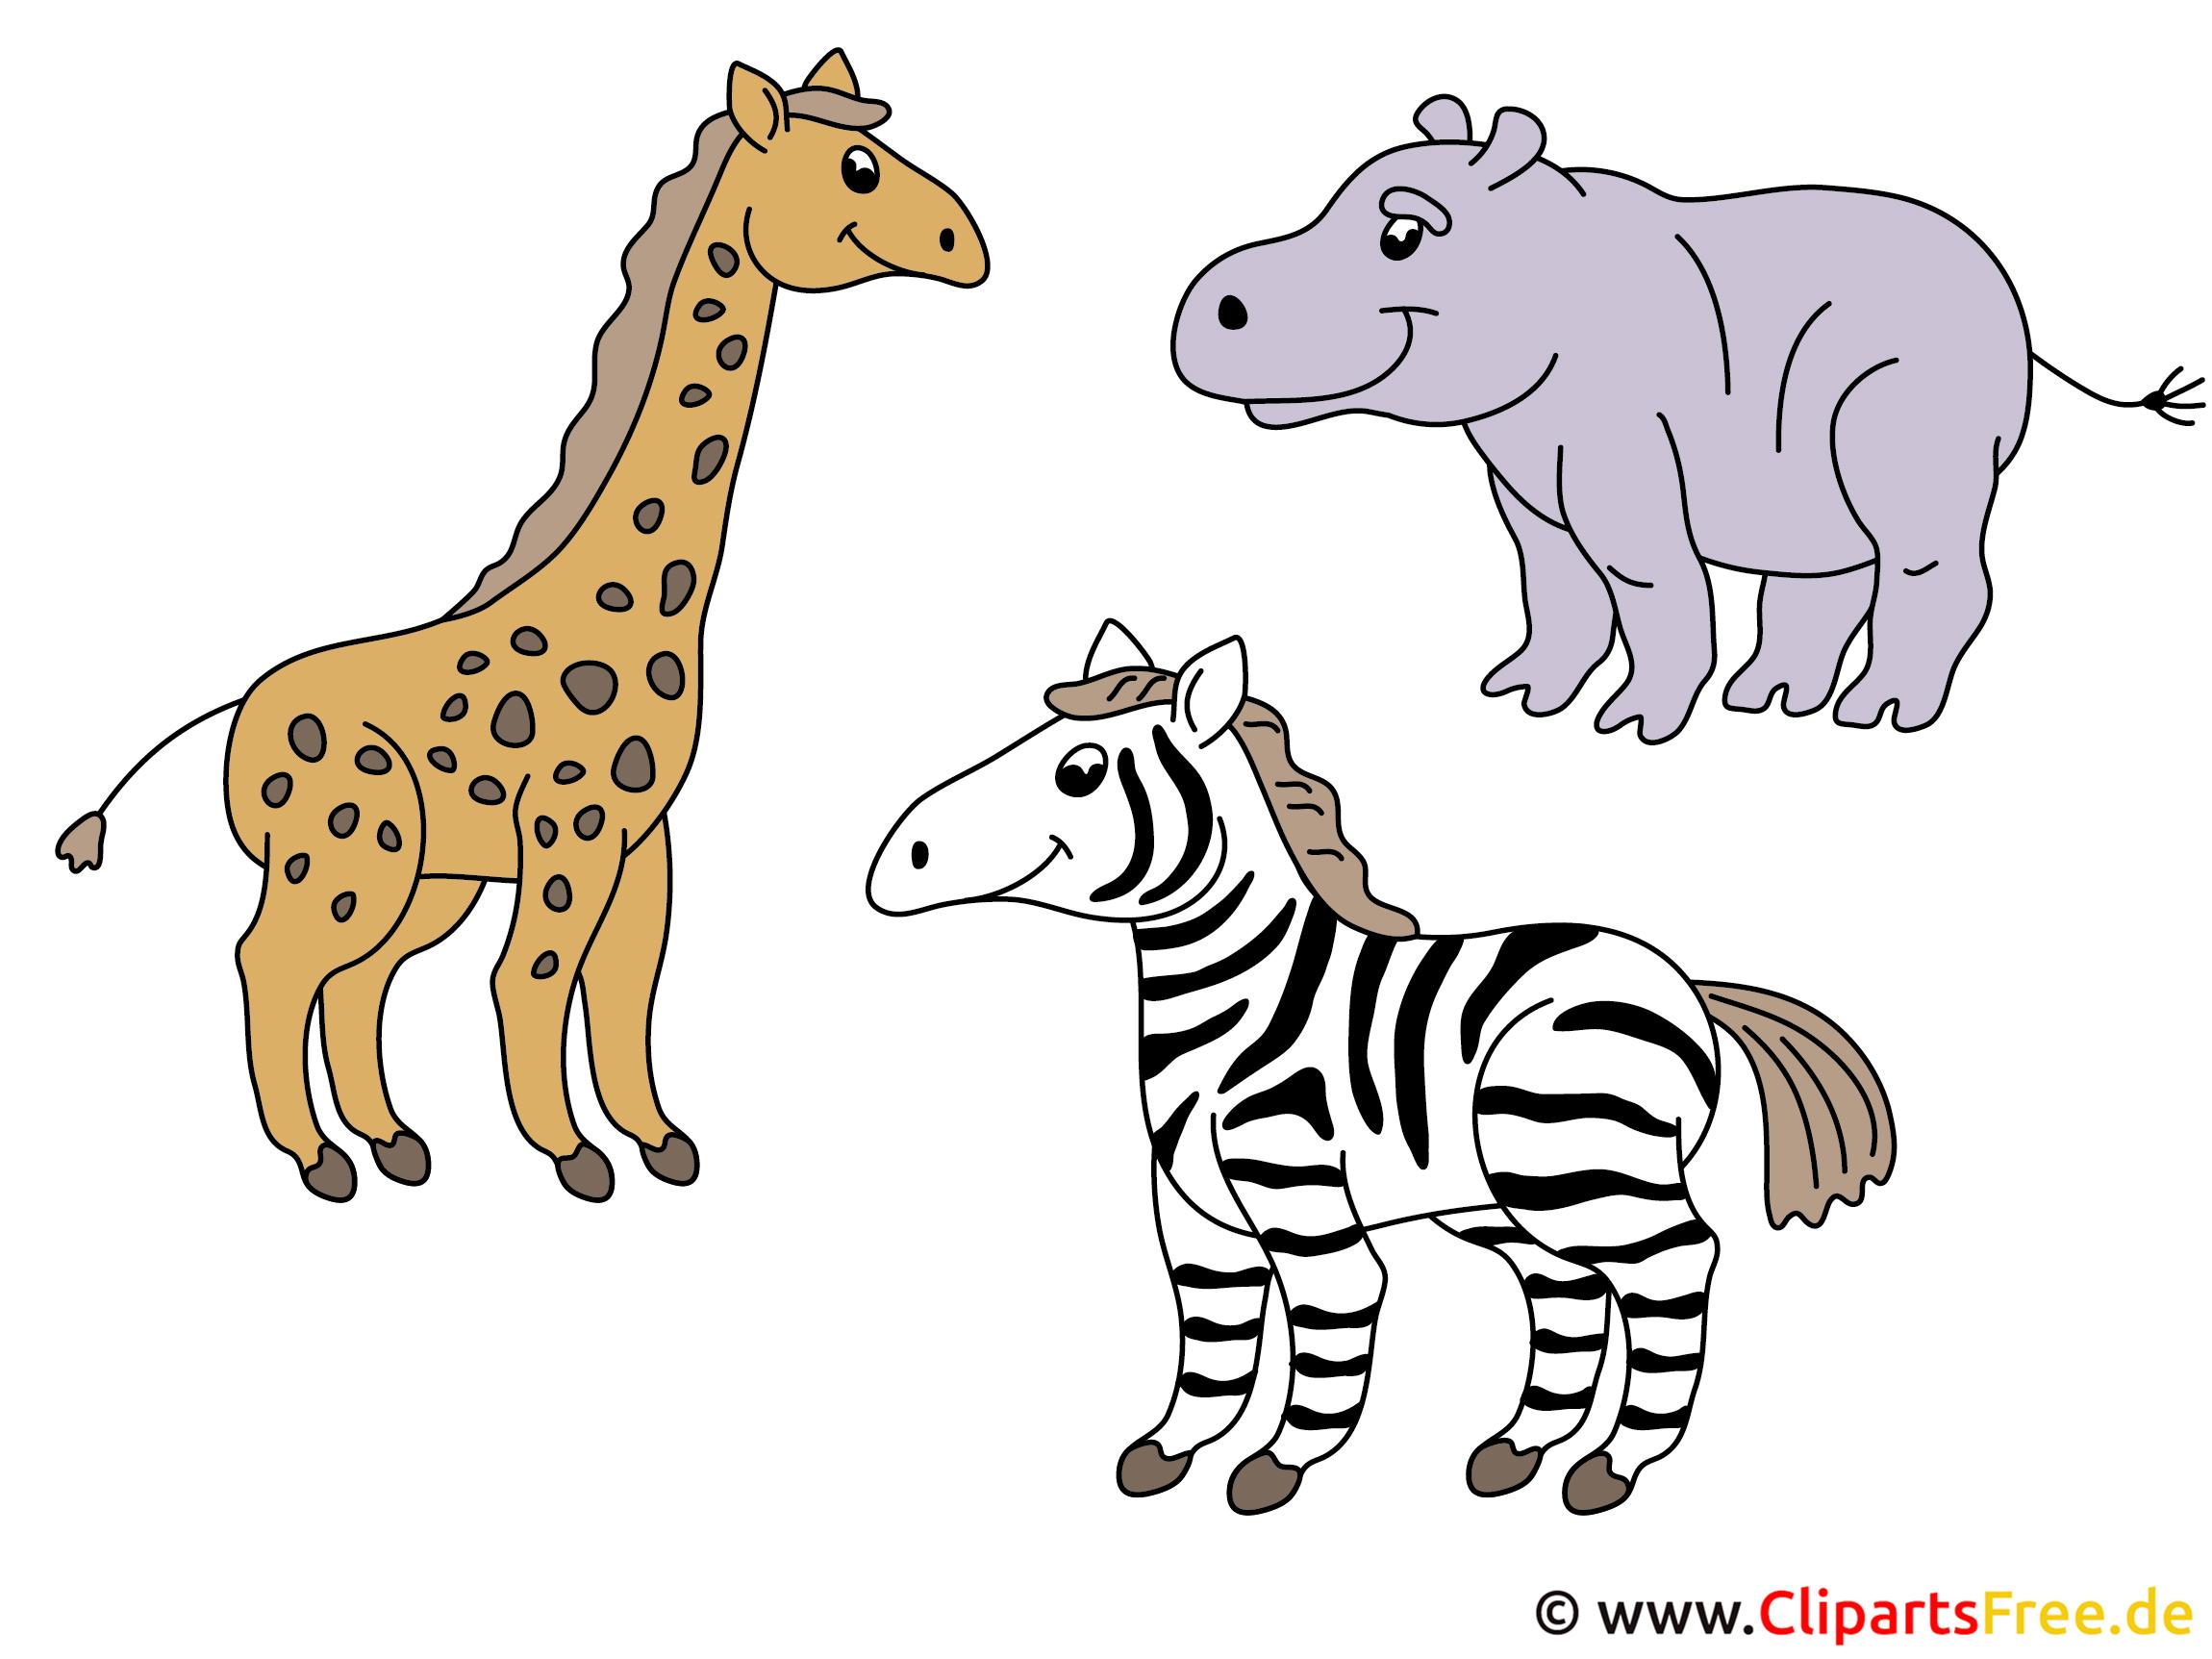 Tierbilder Comic